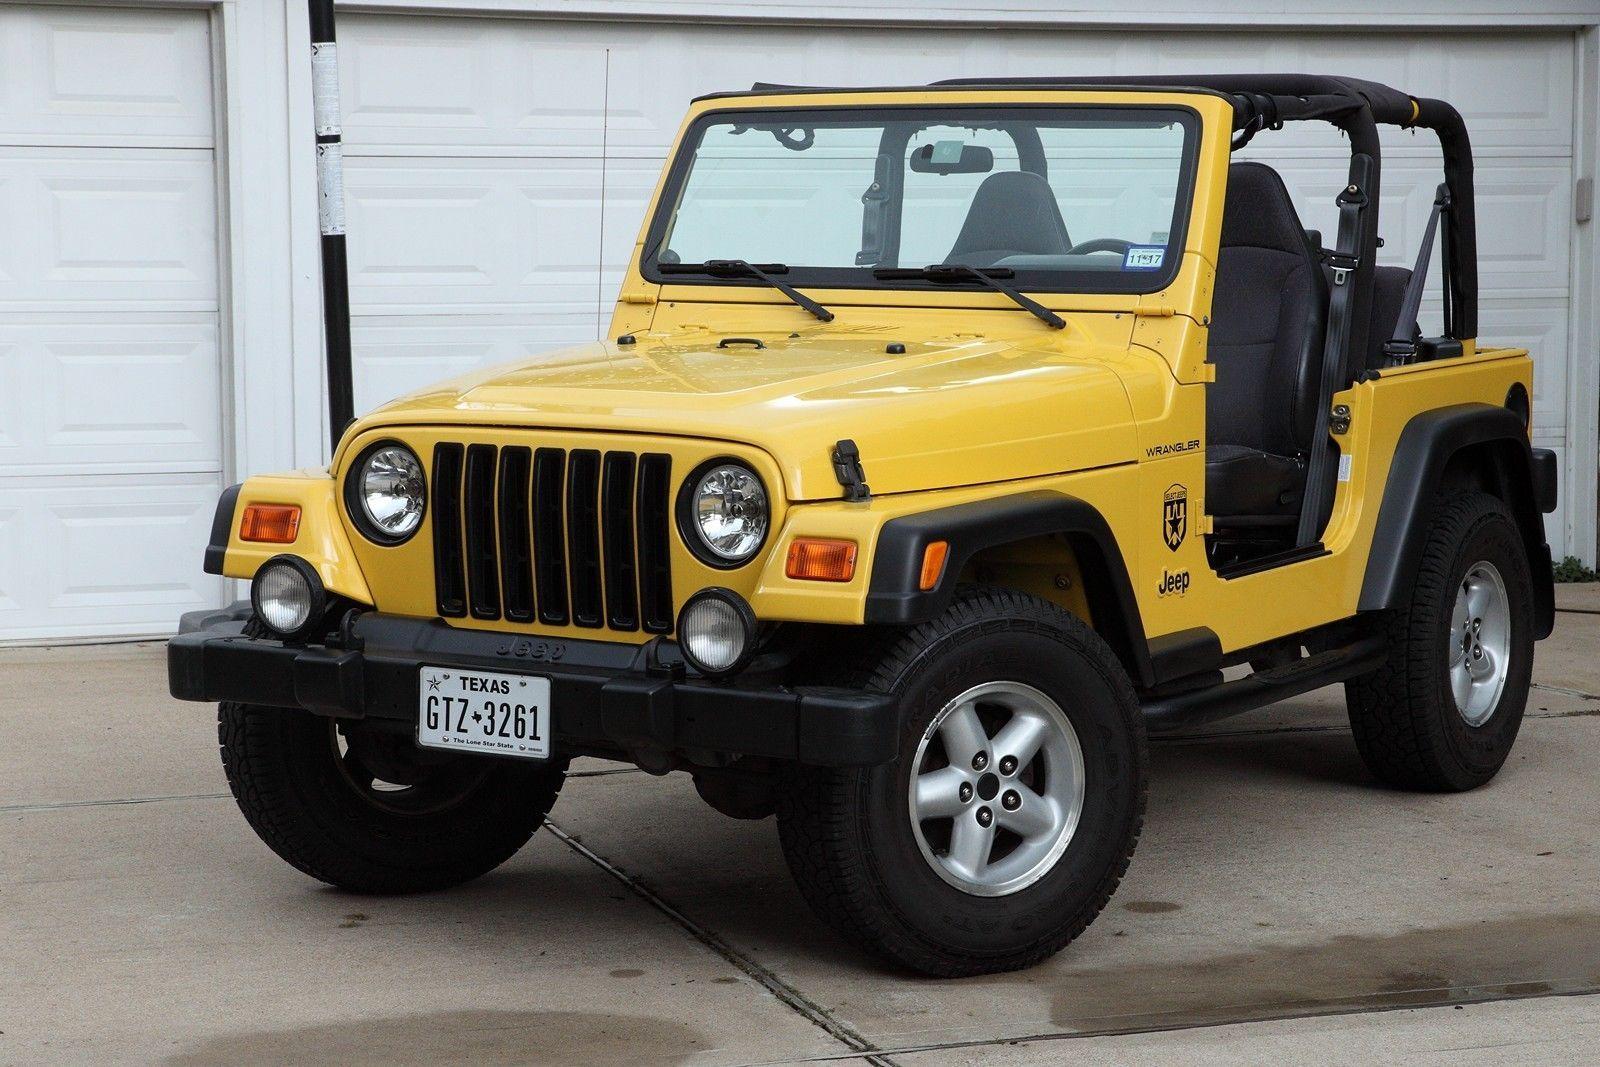 Ebay 2002 jeep wrangler 5 speed yellow hardtop very original condition jeep